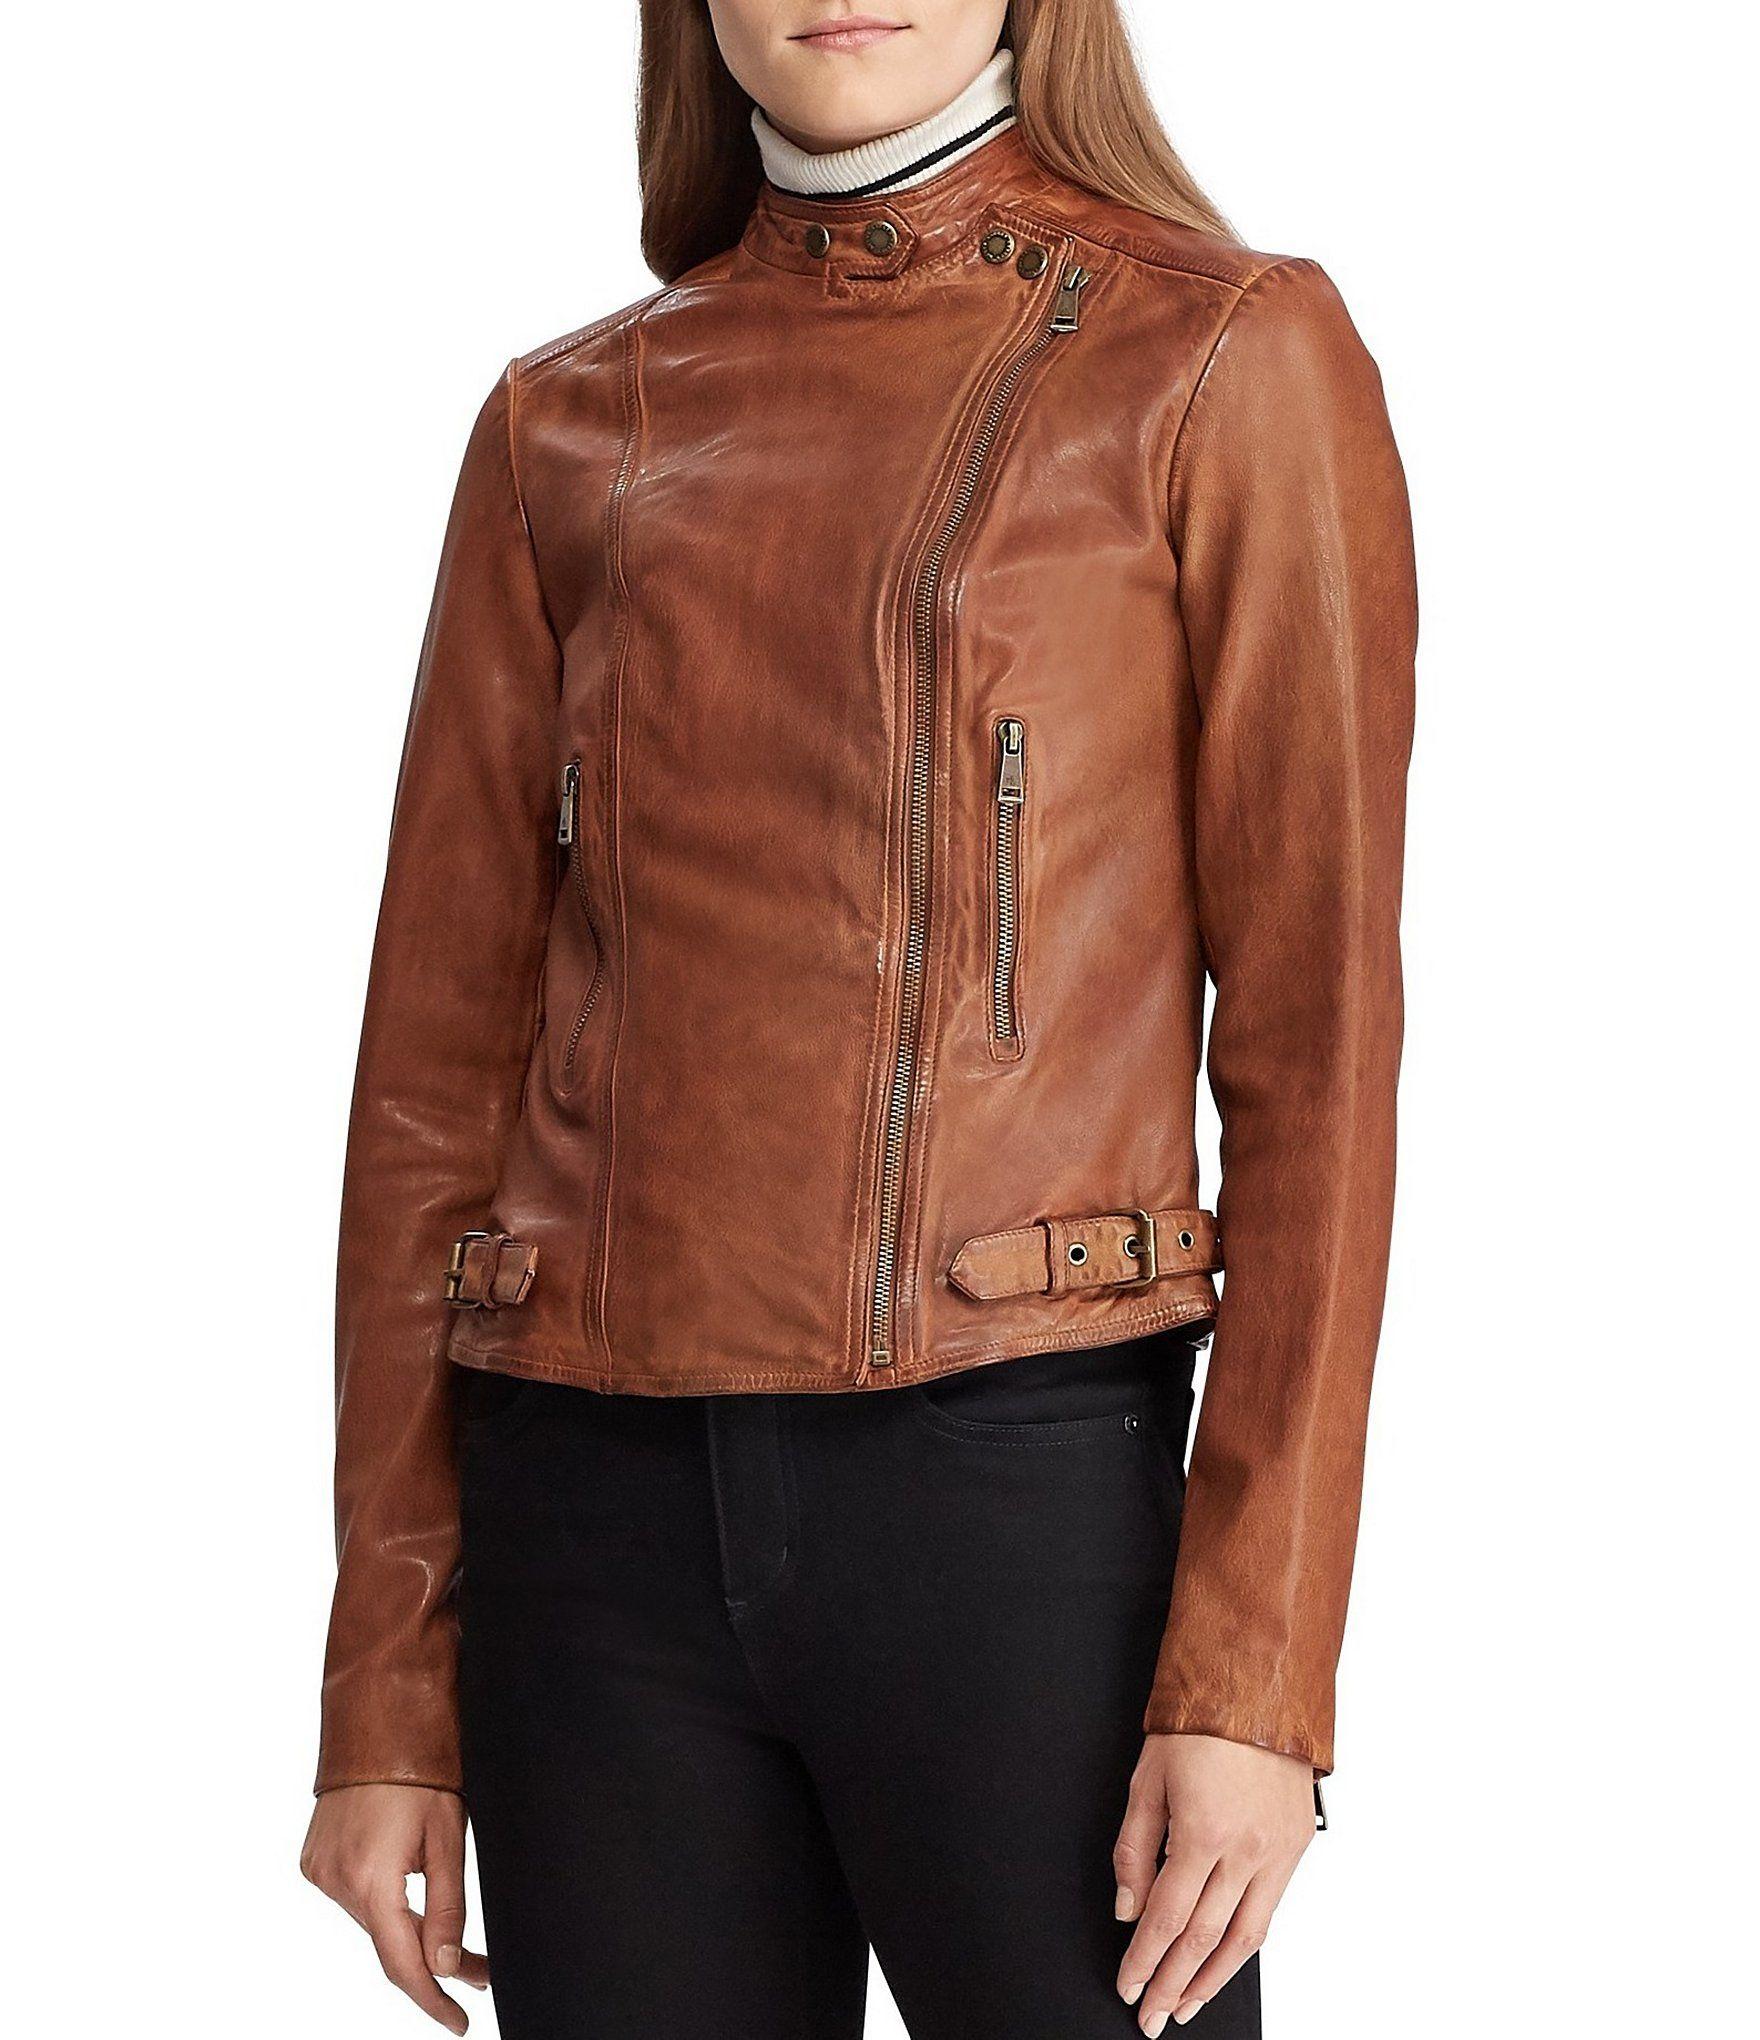 Lauren Ralph Lauren Lambskin Leather Biker Jacket Dillard S Leather Biker Jacket Womens Moto Jacket Leather Moto Jacket [ 2040 x 1760 Pixel ]